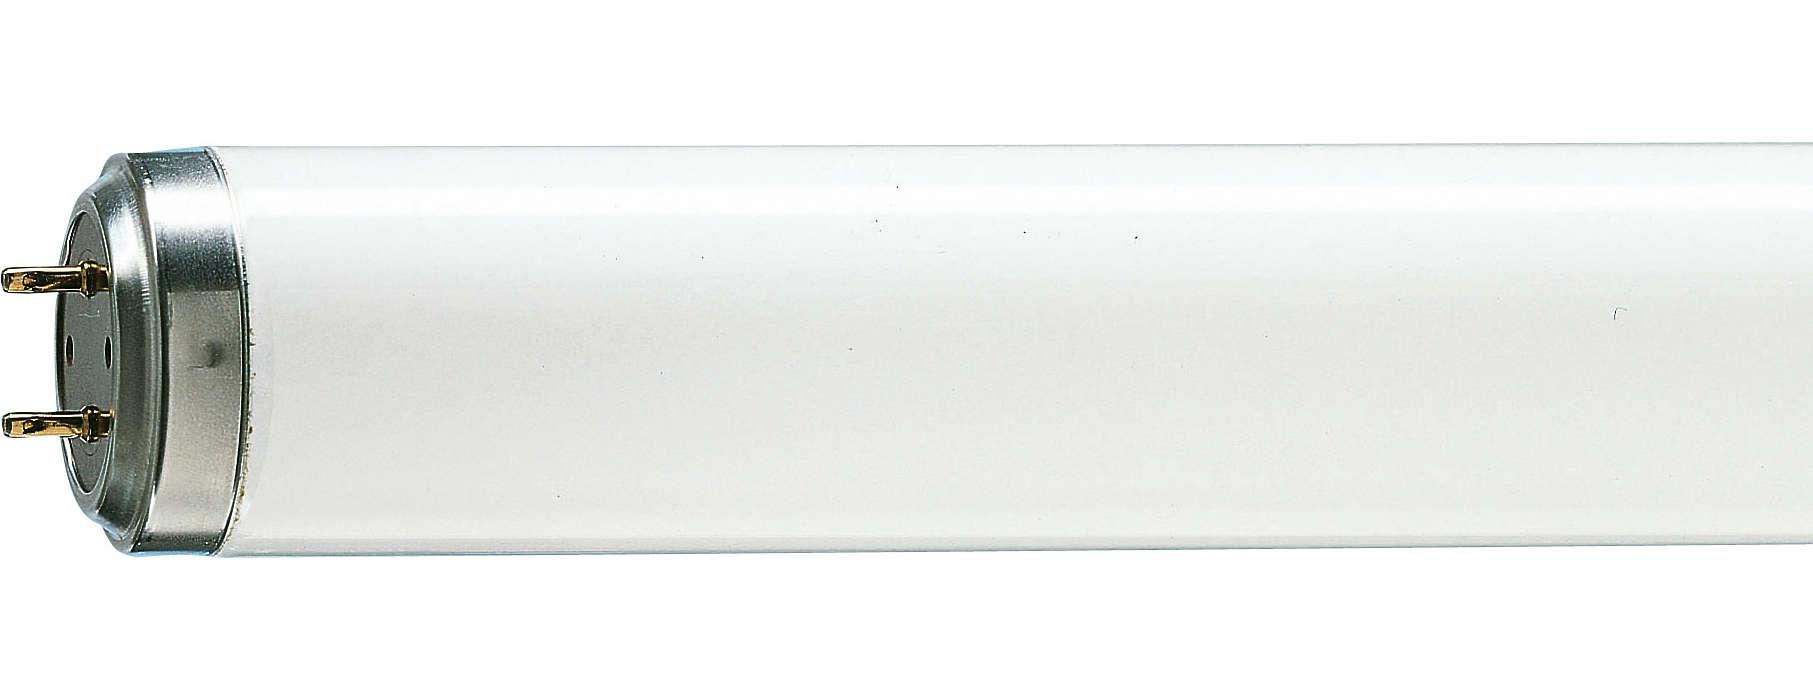 T12 Linear fluorescent lighting